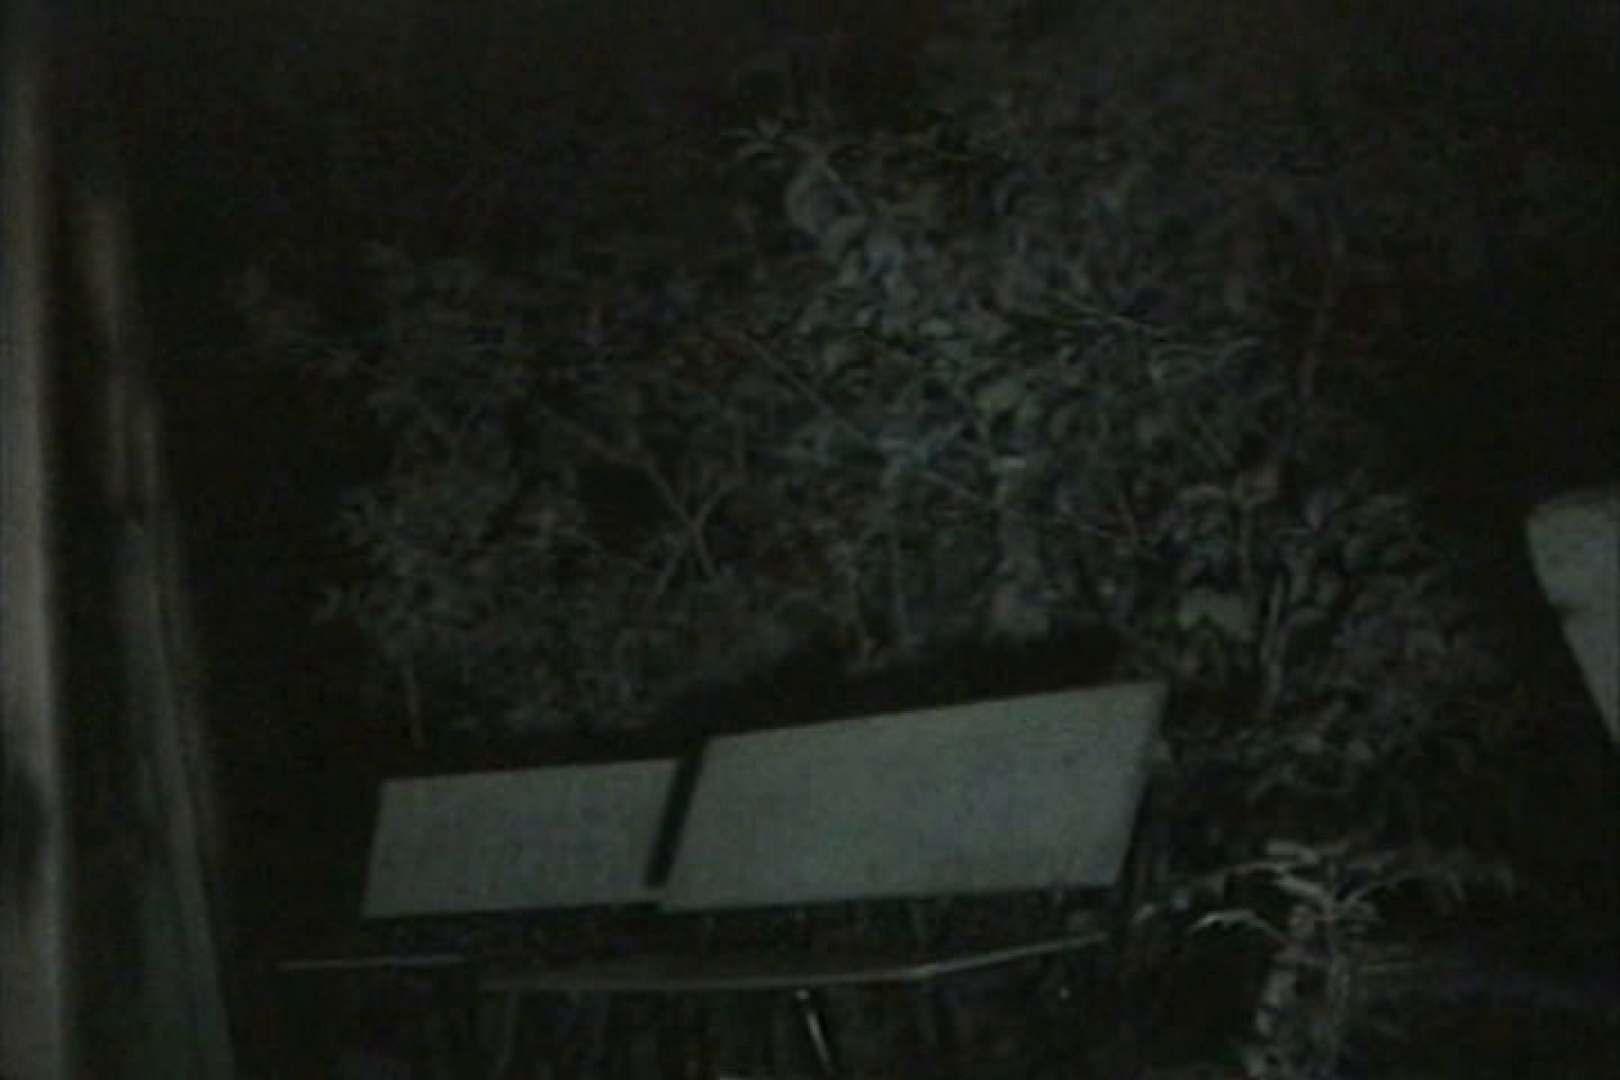 闇の仕掛け人 無修正版 Vol.21 美女OL  108連発 68